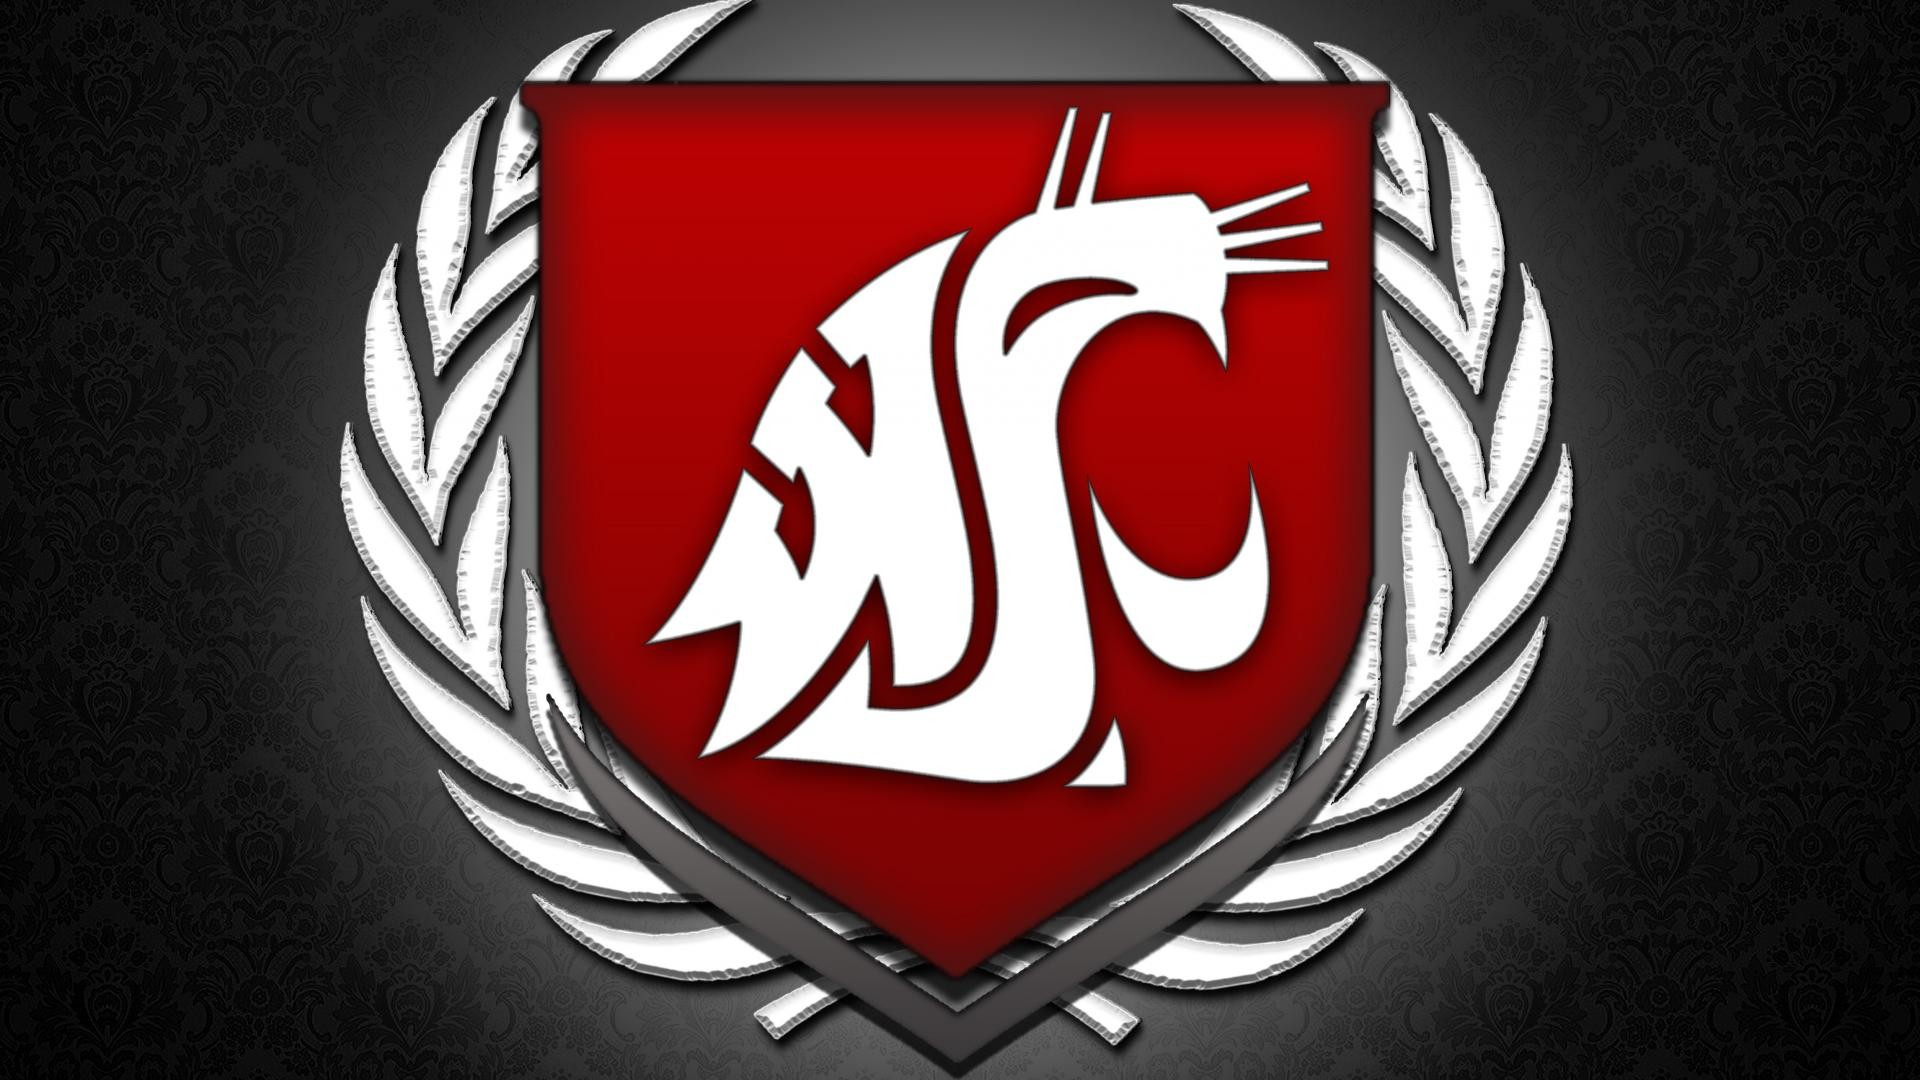 Wsu washington state university cougars wallpaper | (110846)